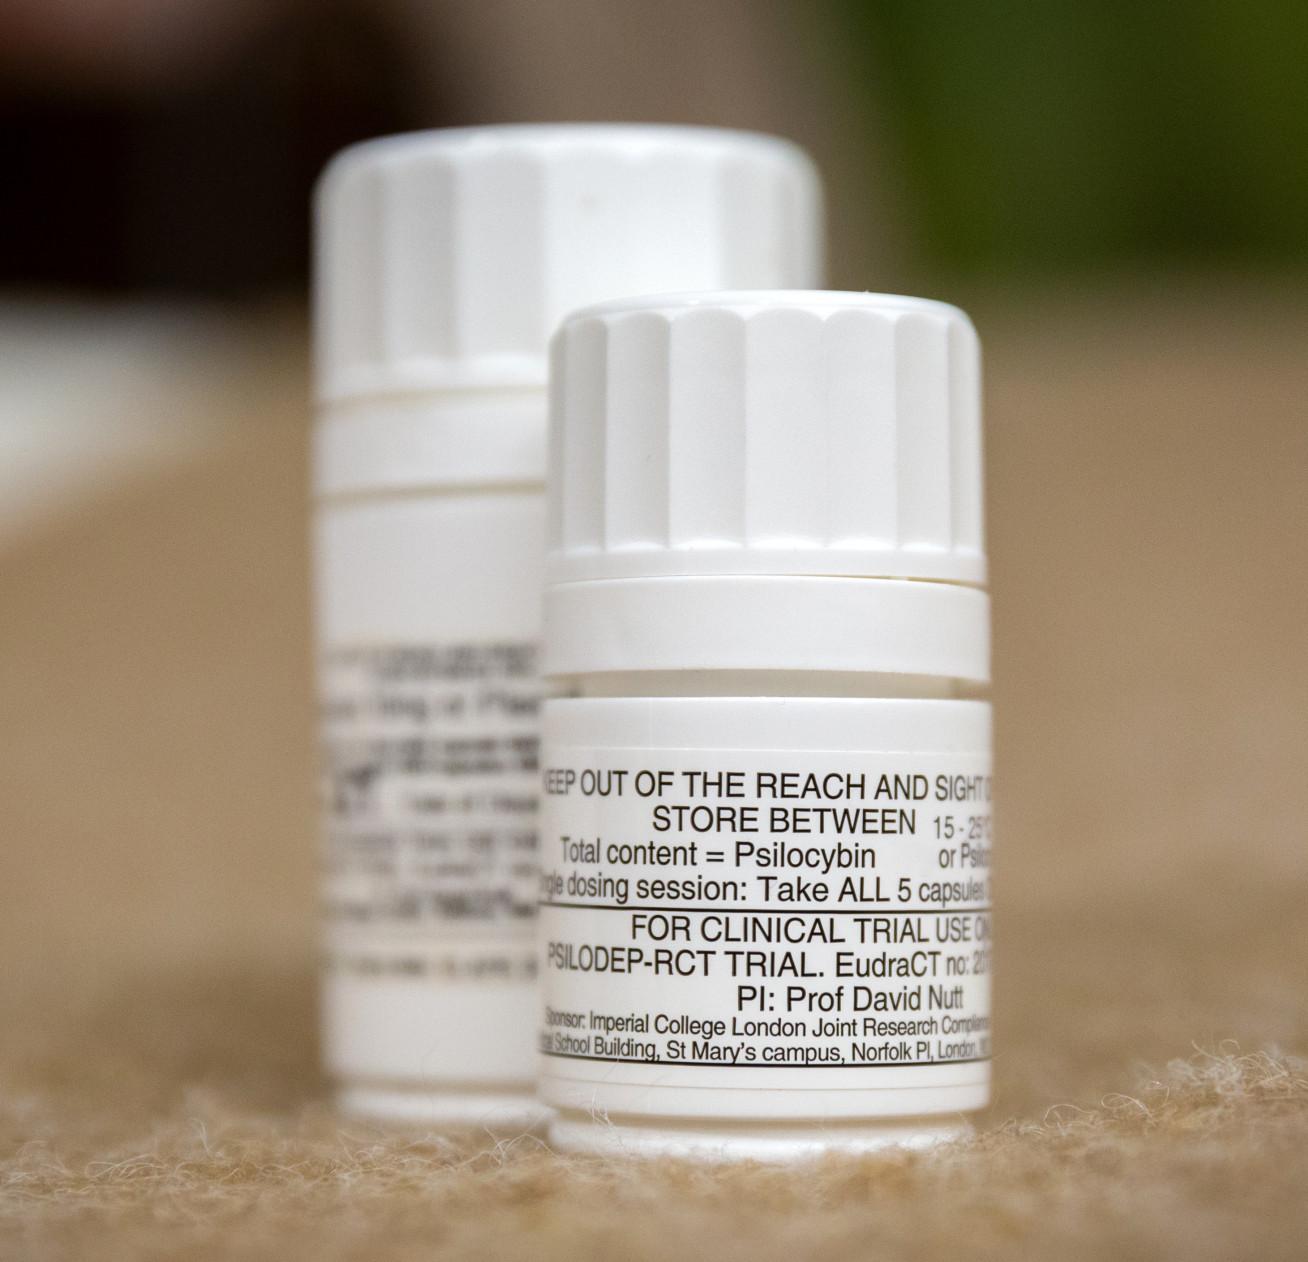 Psilocybin capsules